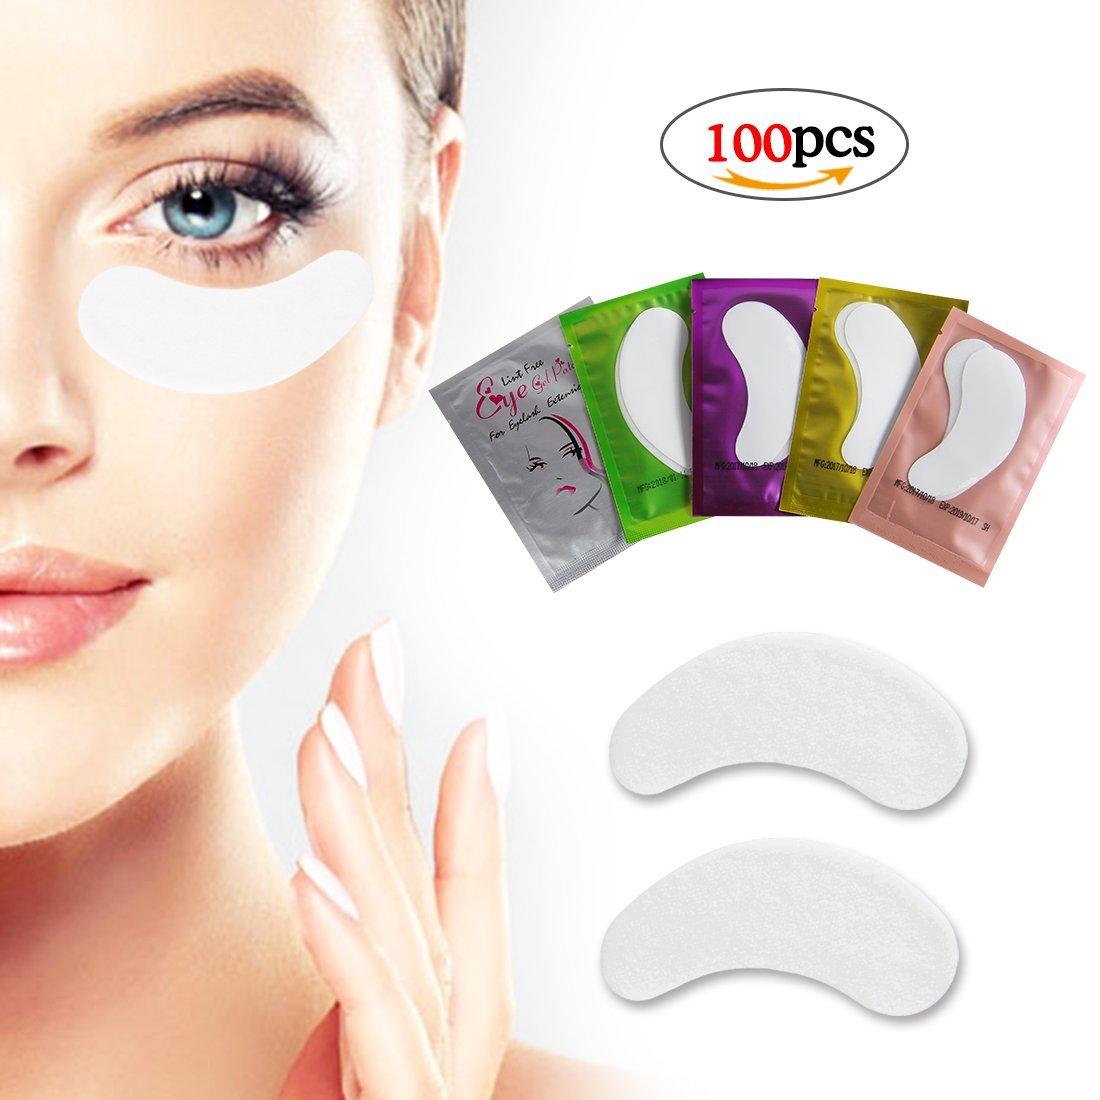 Eye Gel Pads 100 Pairs Set Lint Free Gel Eye Patch for Lash Extension Makeup False Eyelash Professional Under Eye Gel Pads 5 Colors Eye Mask Beauty Tool by LK LANKIZ